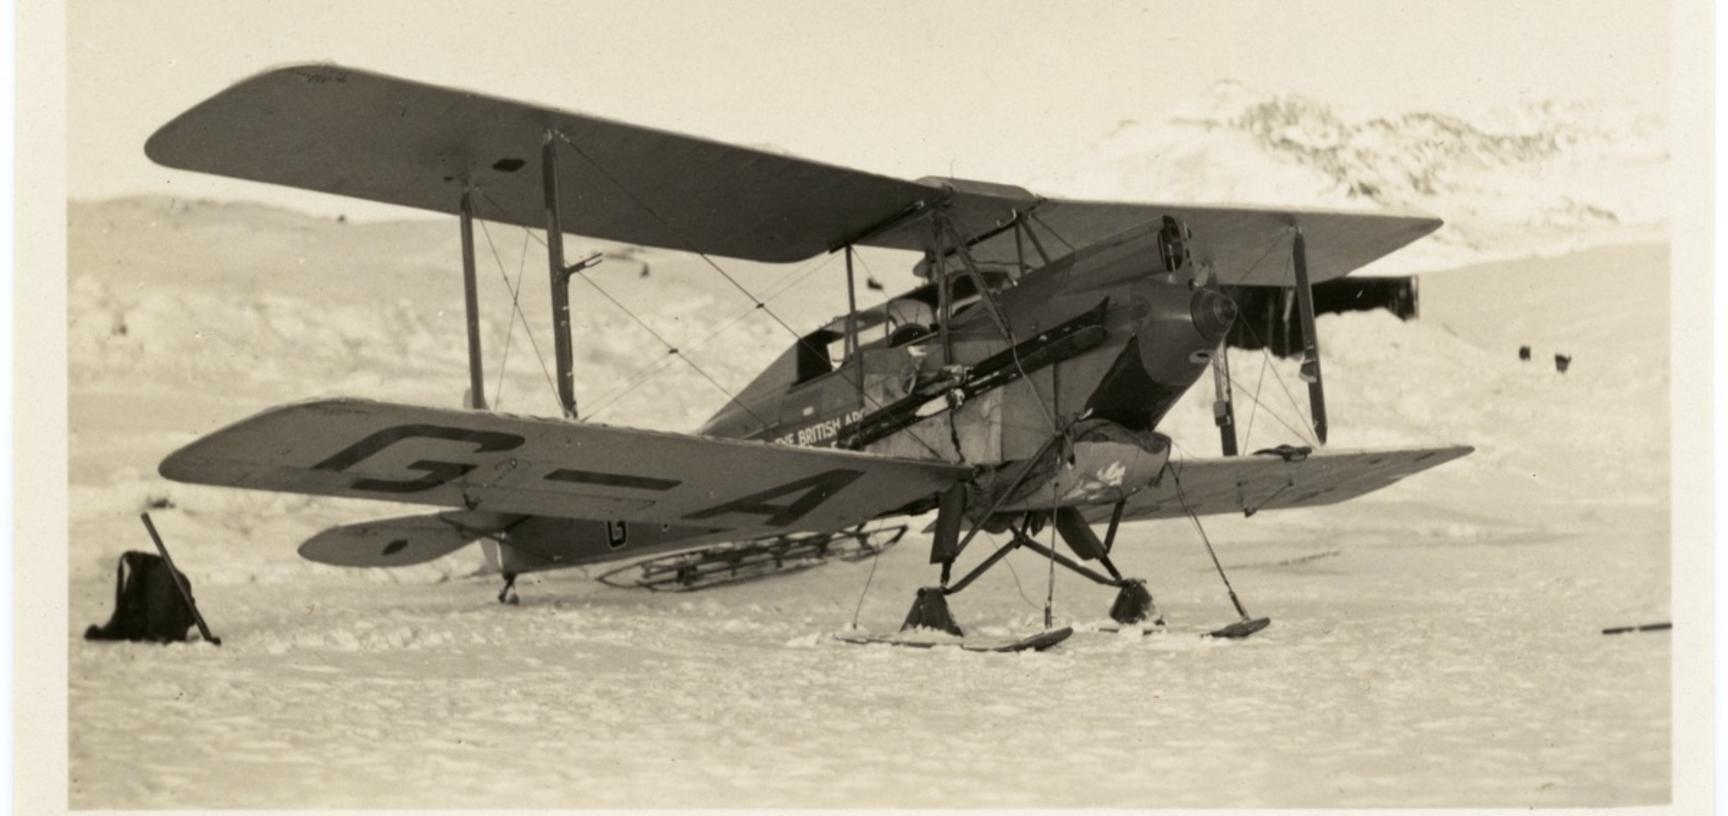 A small De Havilland Moth biplane, Greenland 1930–1931.